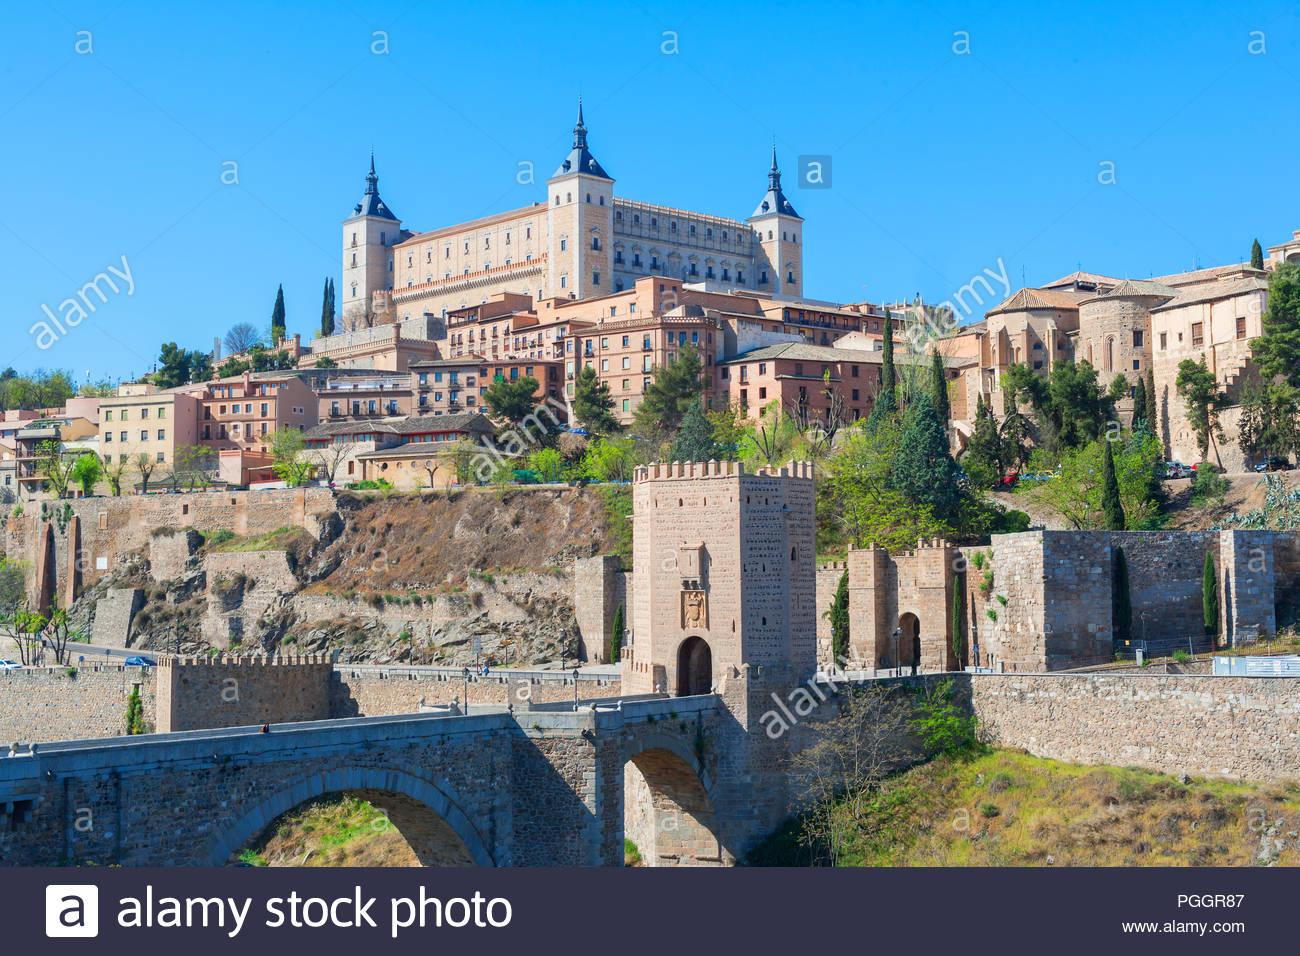 Toledo Province; Bridge - Man Made Structure; Castle; Spain; House; Scenics; Architecture; Blue; Built Structure; Castilla La Mancha; Cityscape; Color - Stock Image